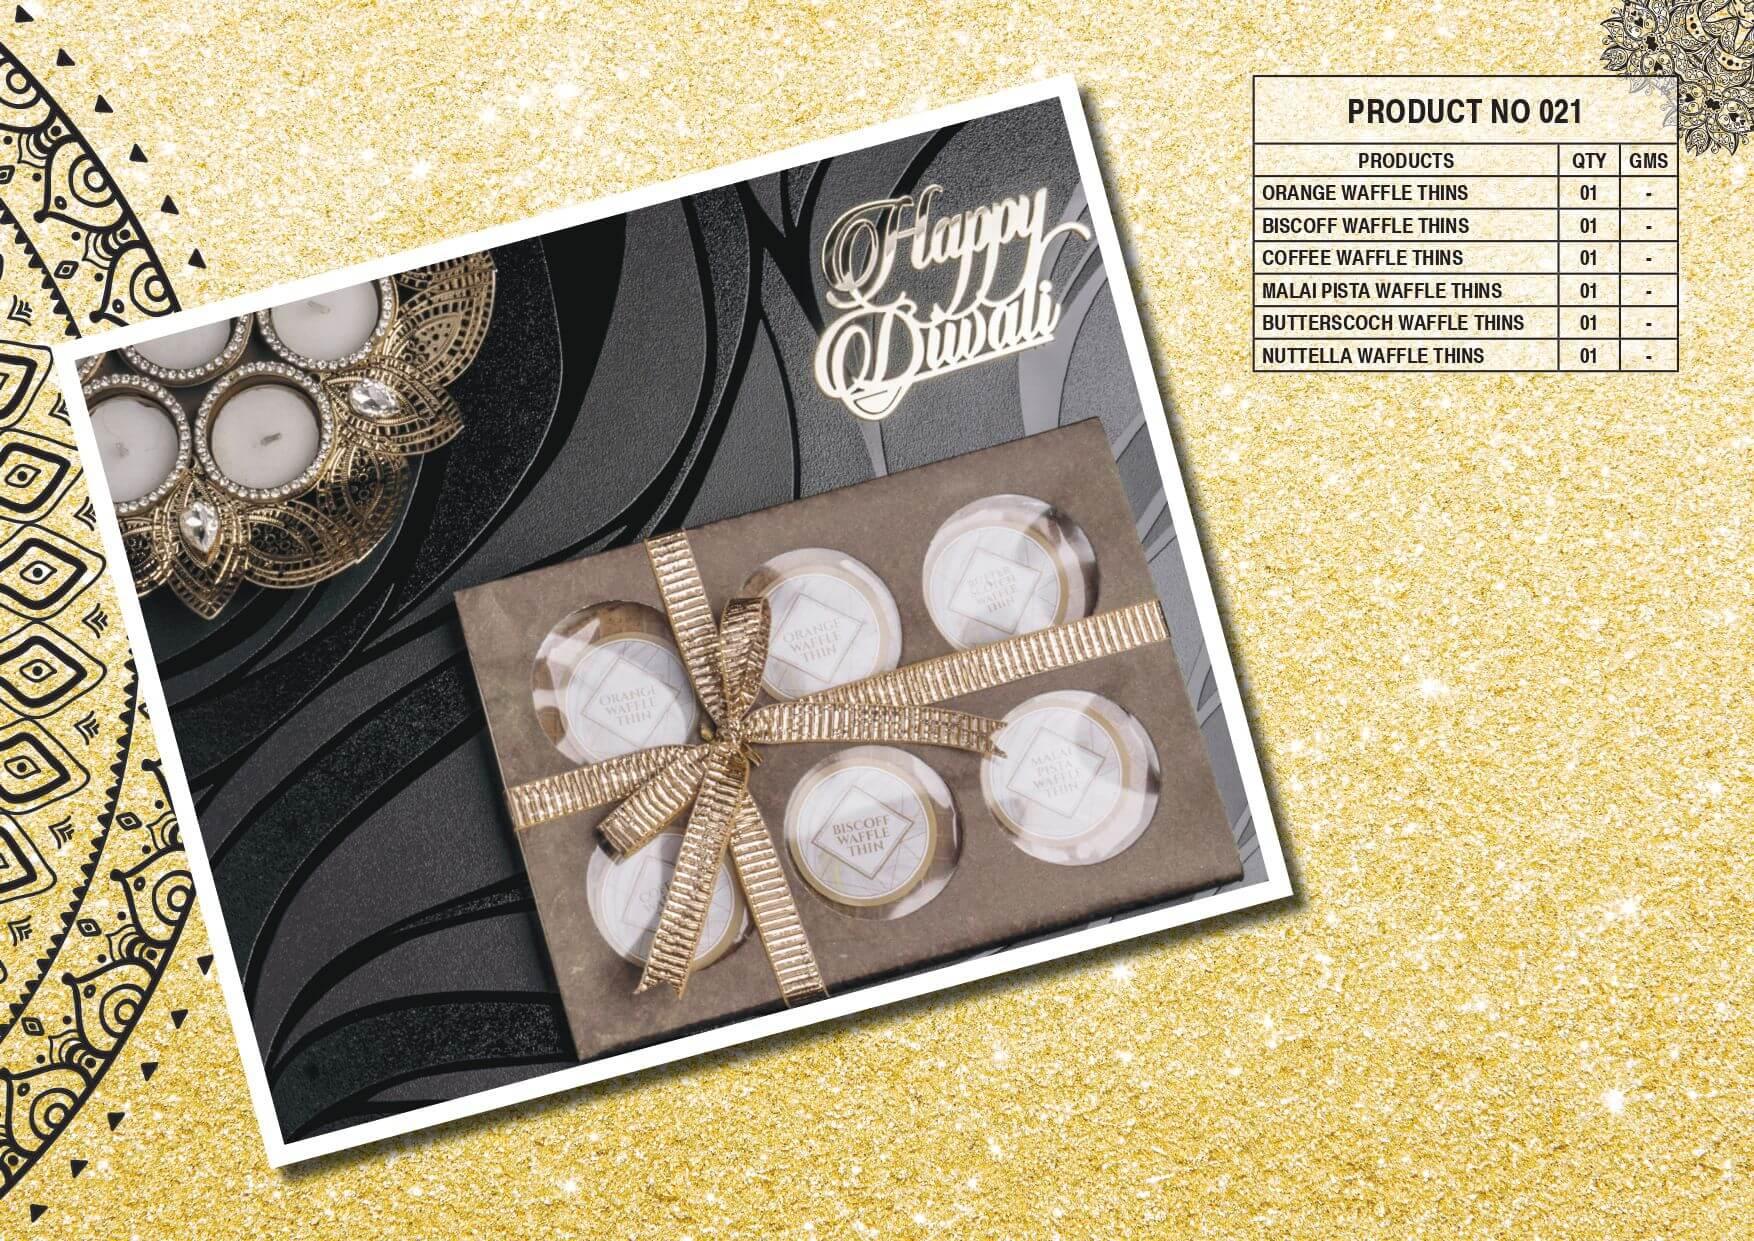 Diwali Sweets PRODUCT NO 021